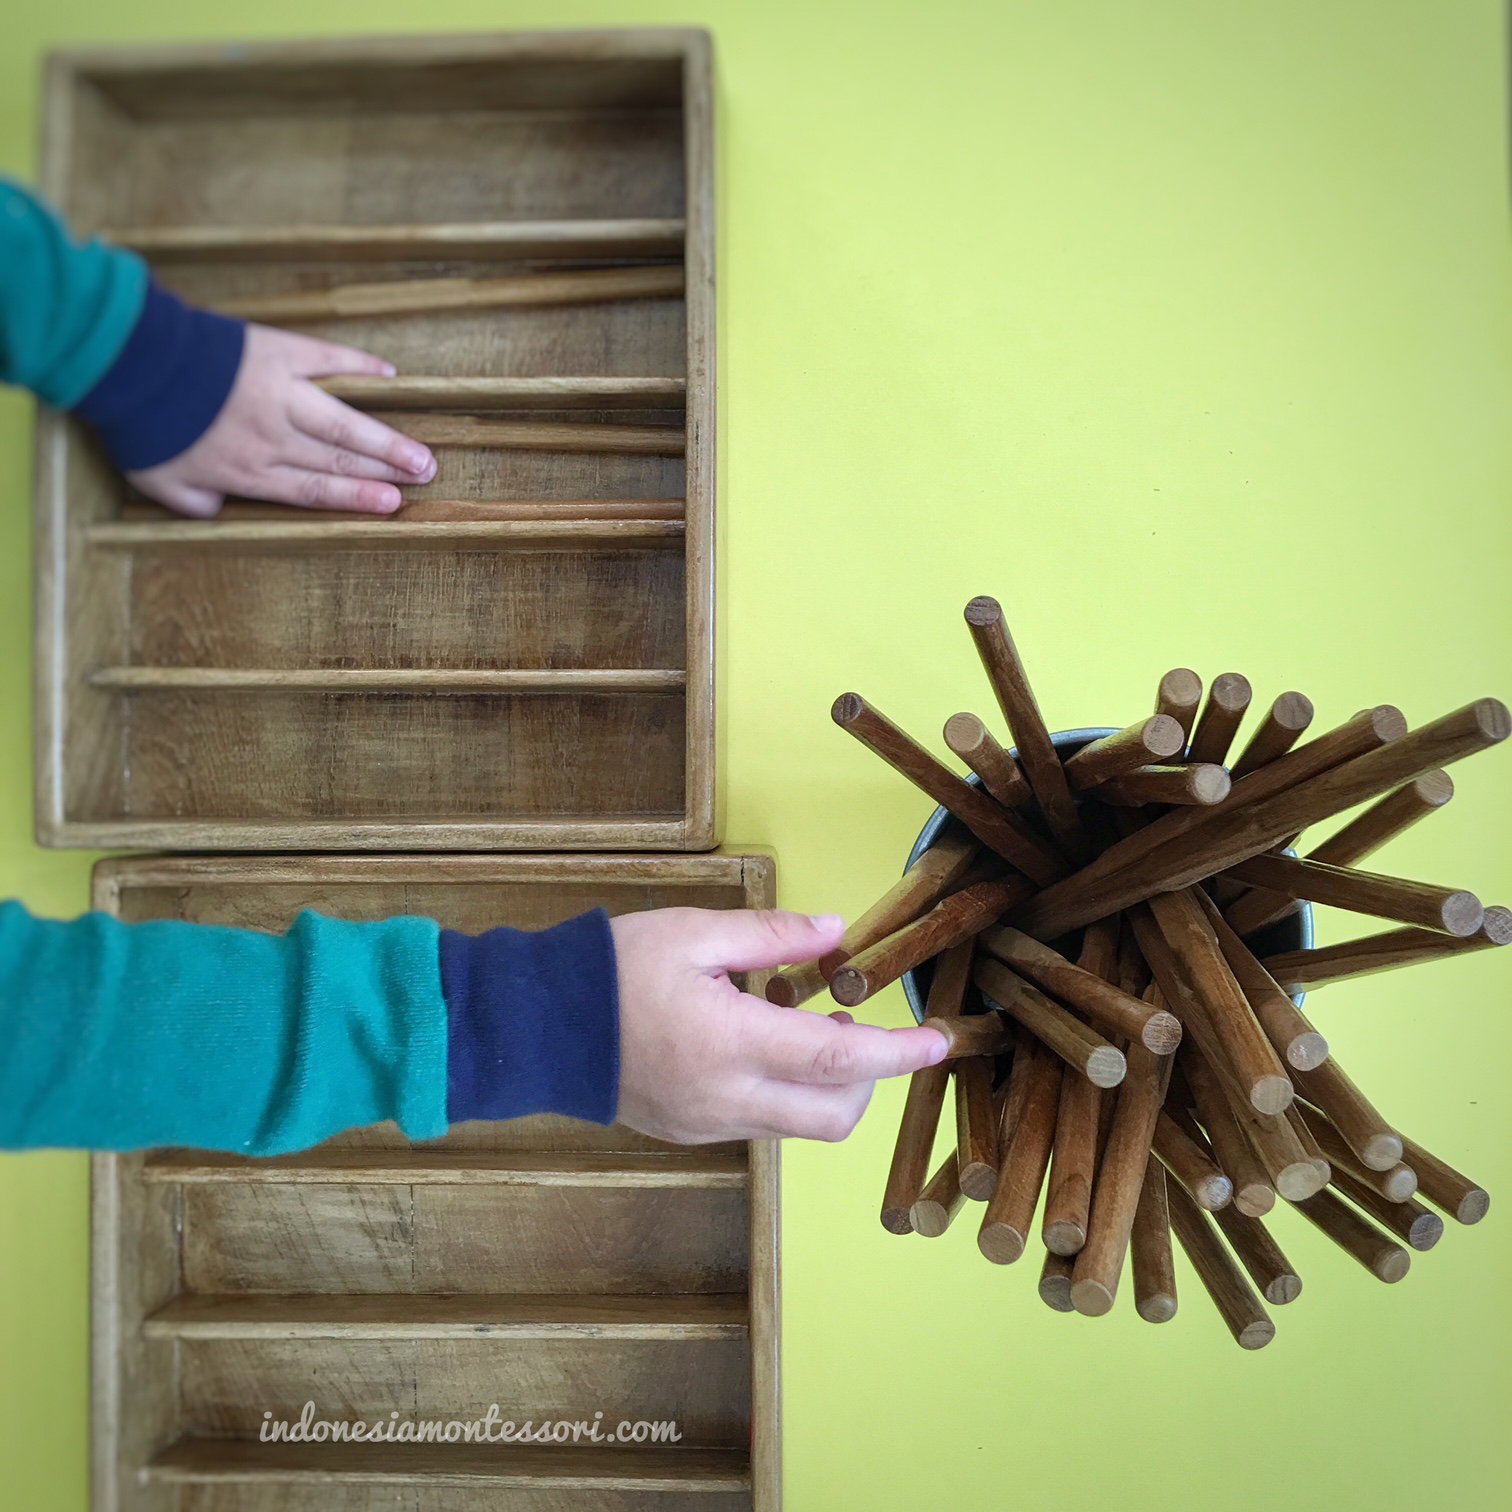 montessori spindle box